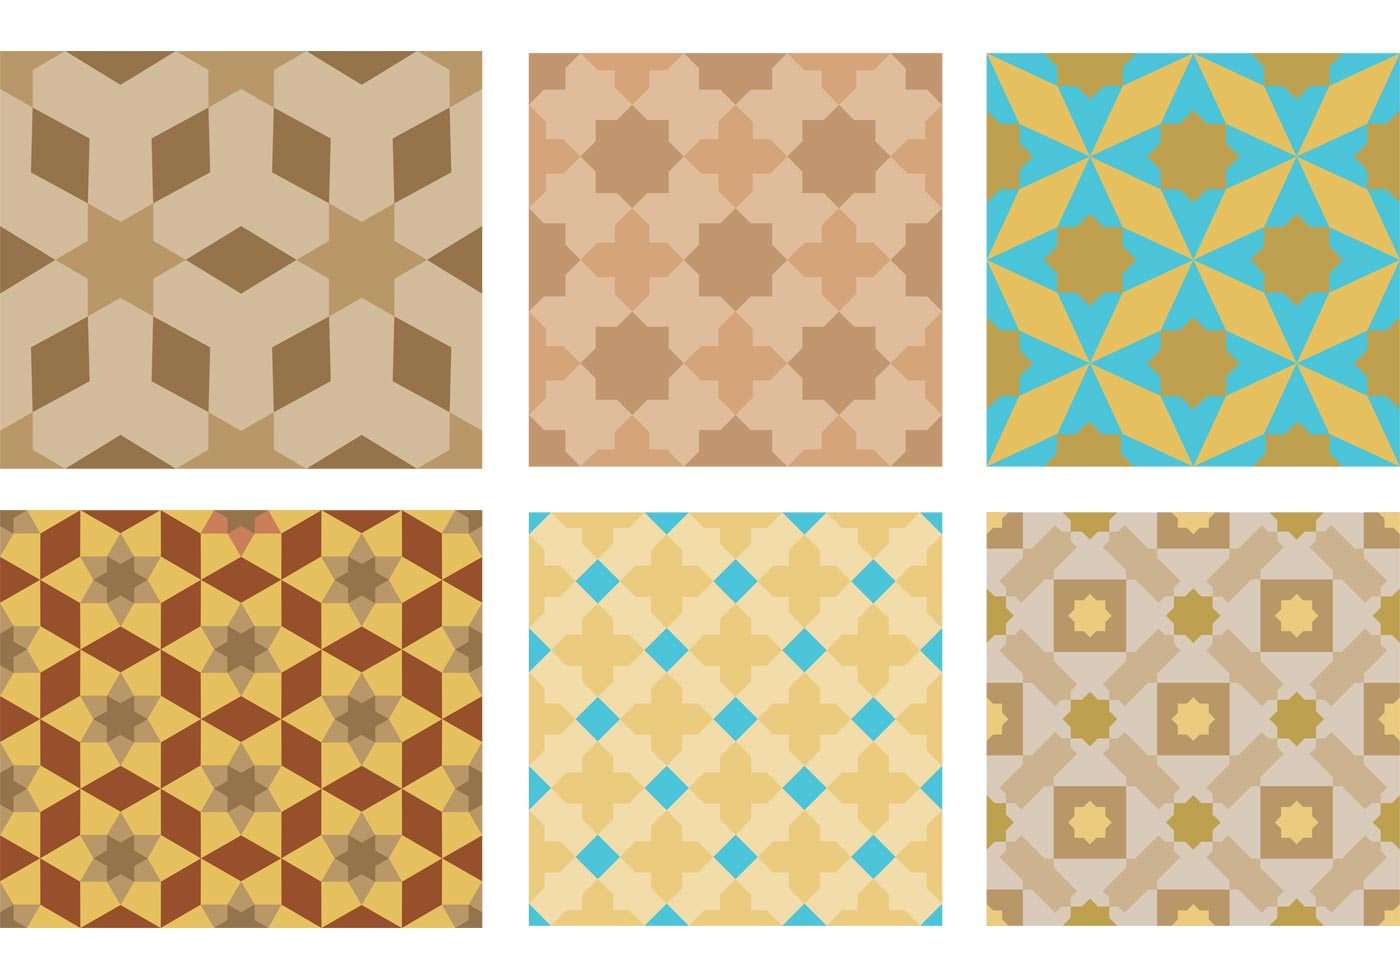 Morocco Motif Pattern Vectors Download Free Vector Art Stock Graphics Amp Images